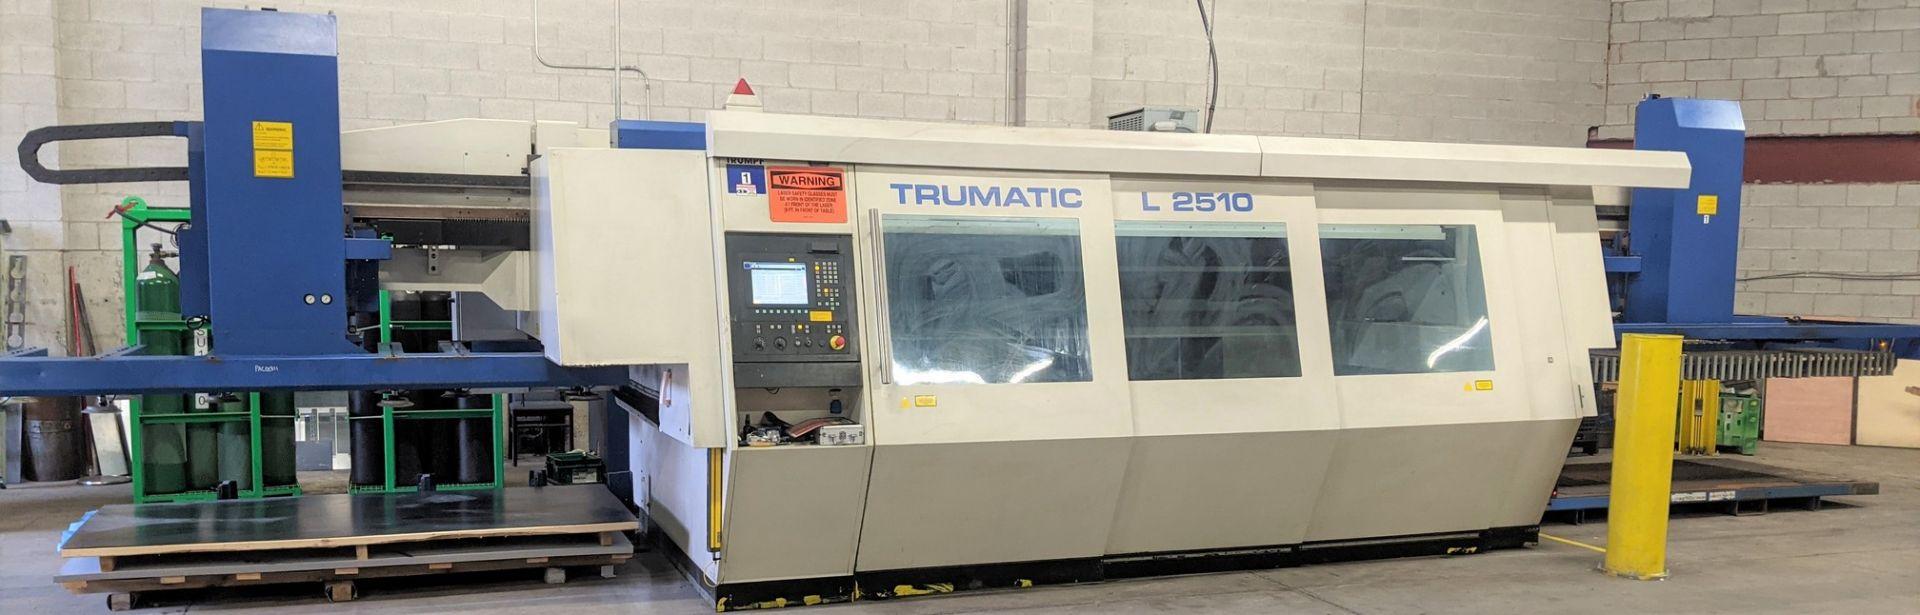 "2006 TRUMPF TRUMATIC L 2510 CNC LASER, 2,000 WATT, 4' X 10' TABLE, TRAVELS: X-120"", Y-50"", Z-"